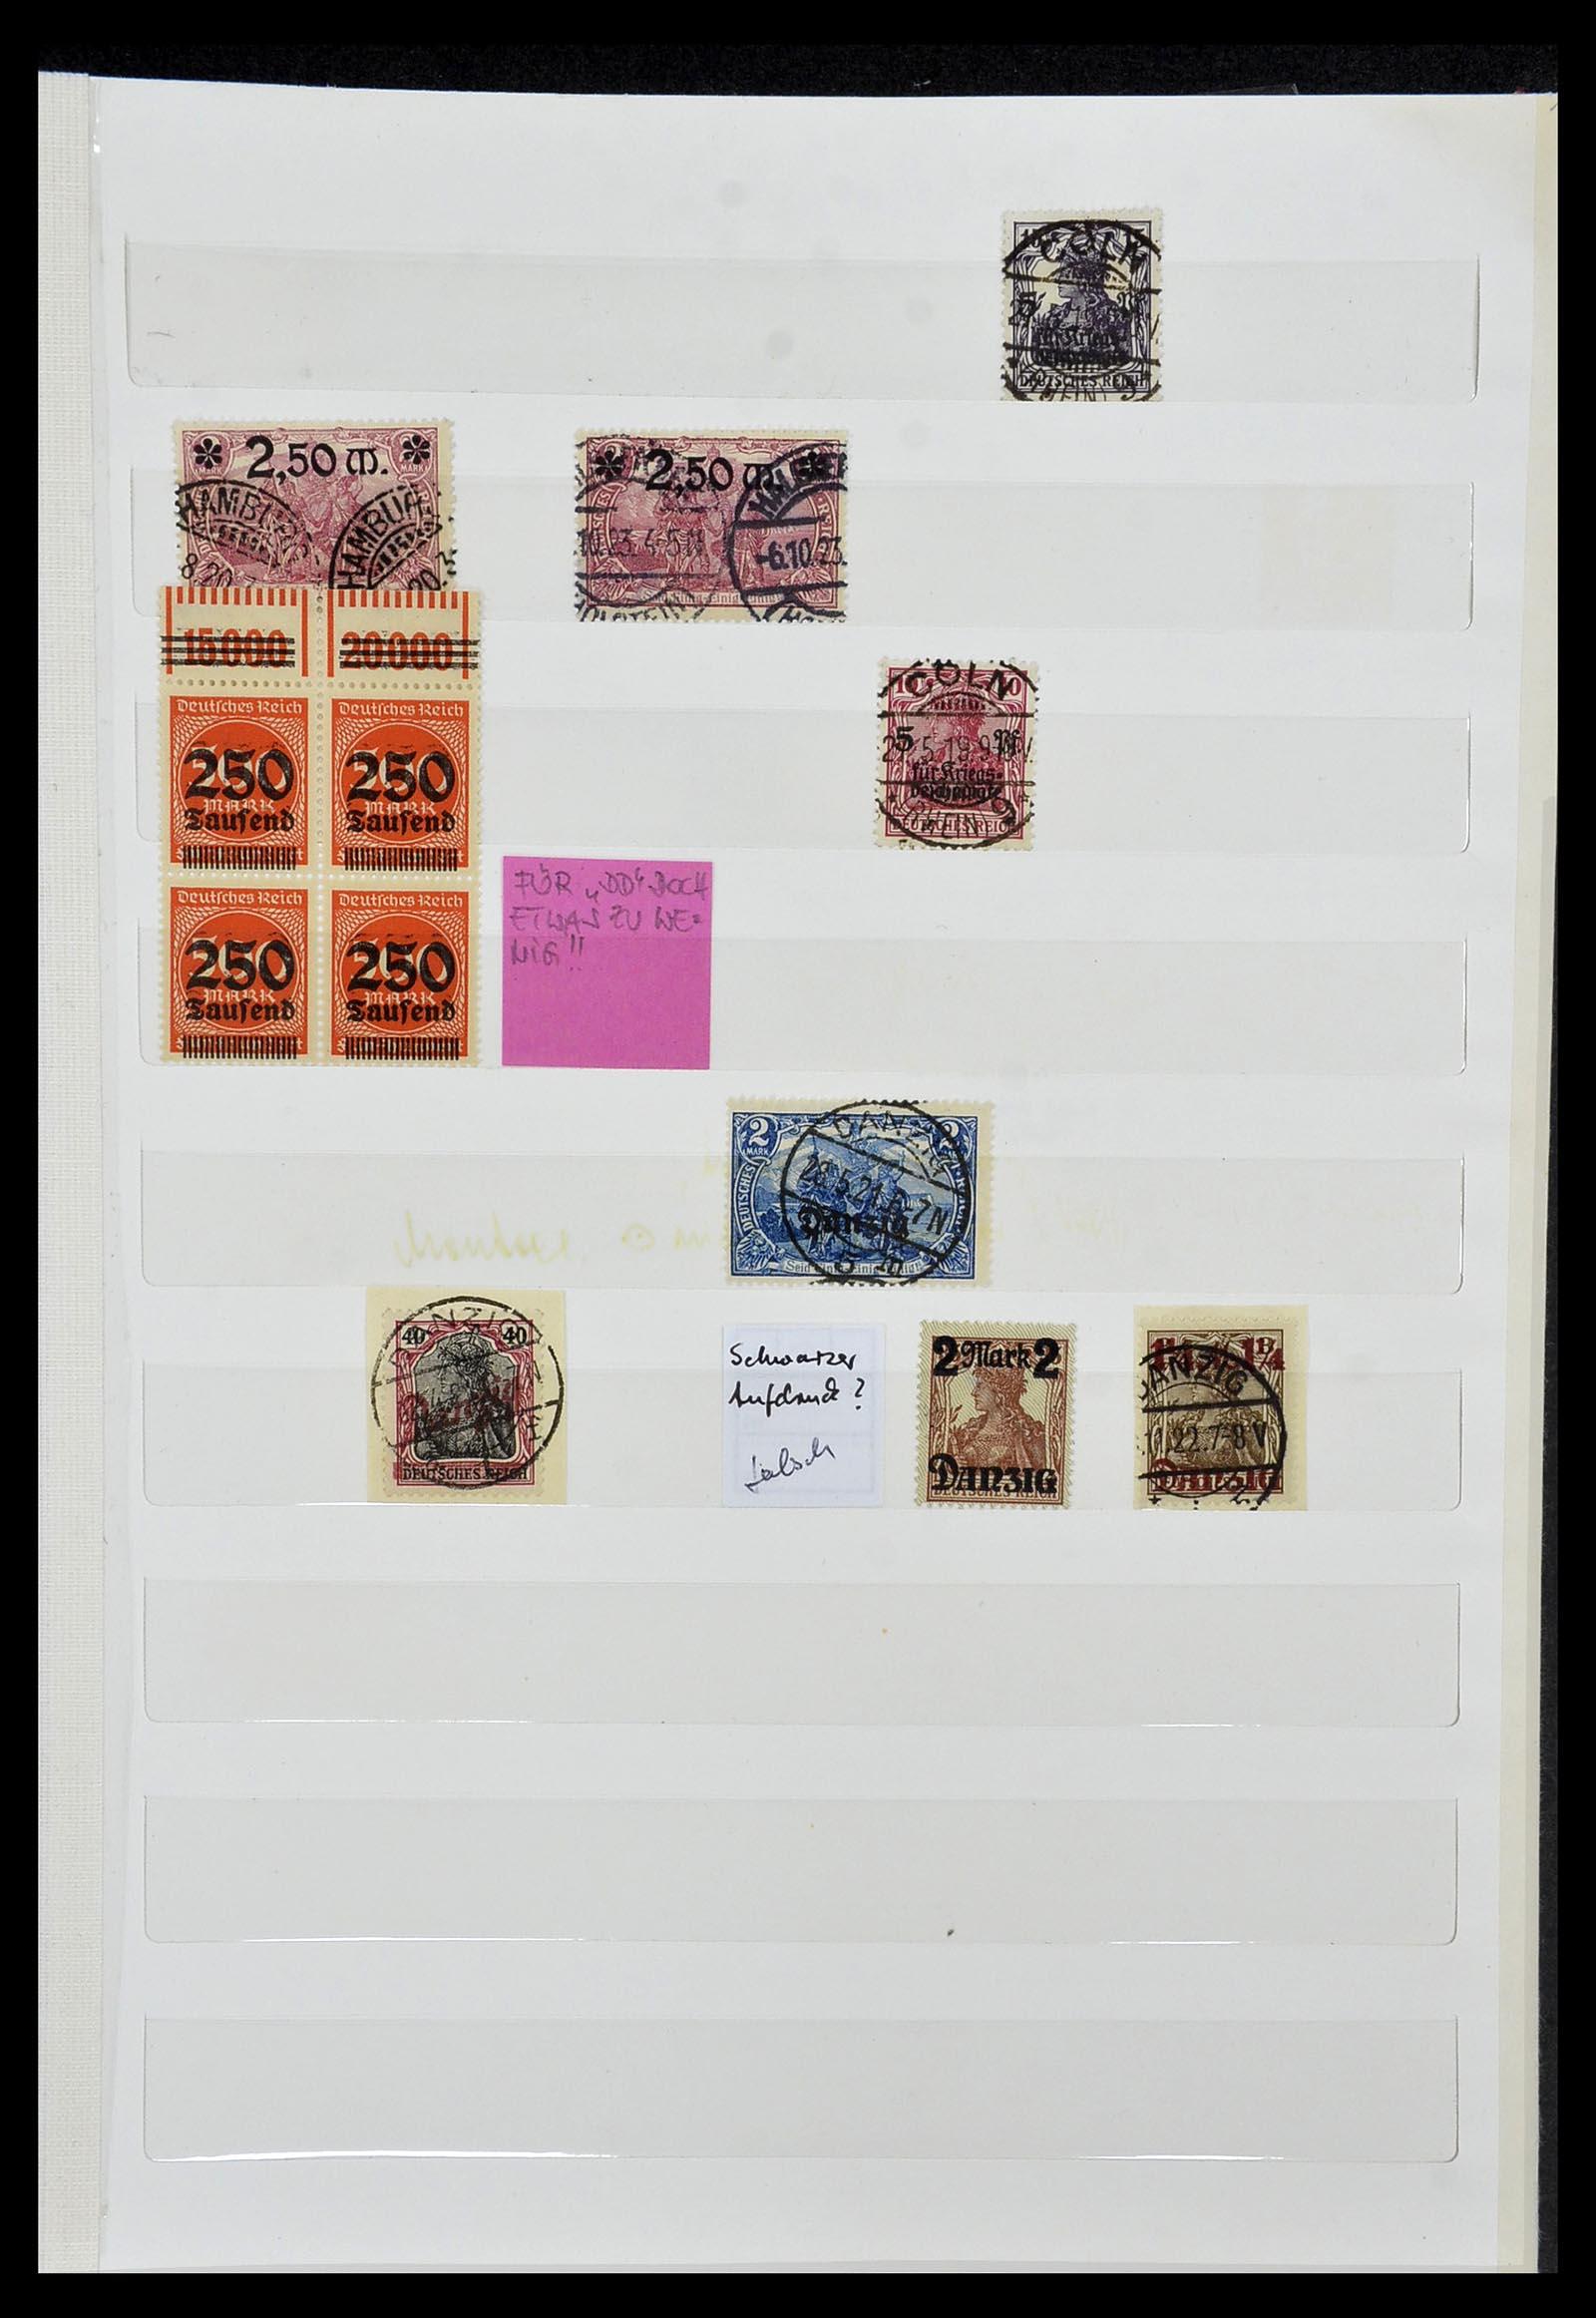 34069 001 - Postzegelverzameling 34069 Duitsland 1855-1952.